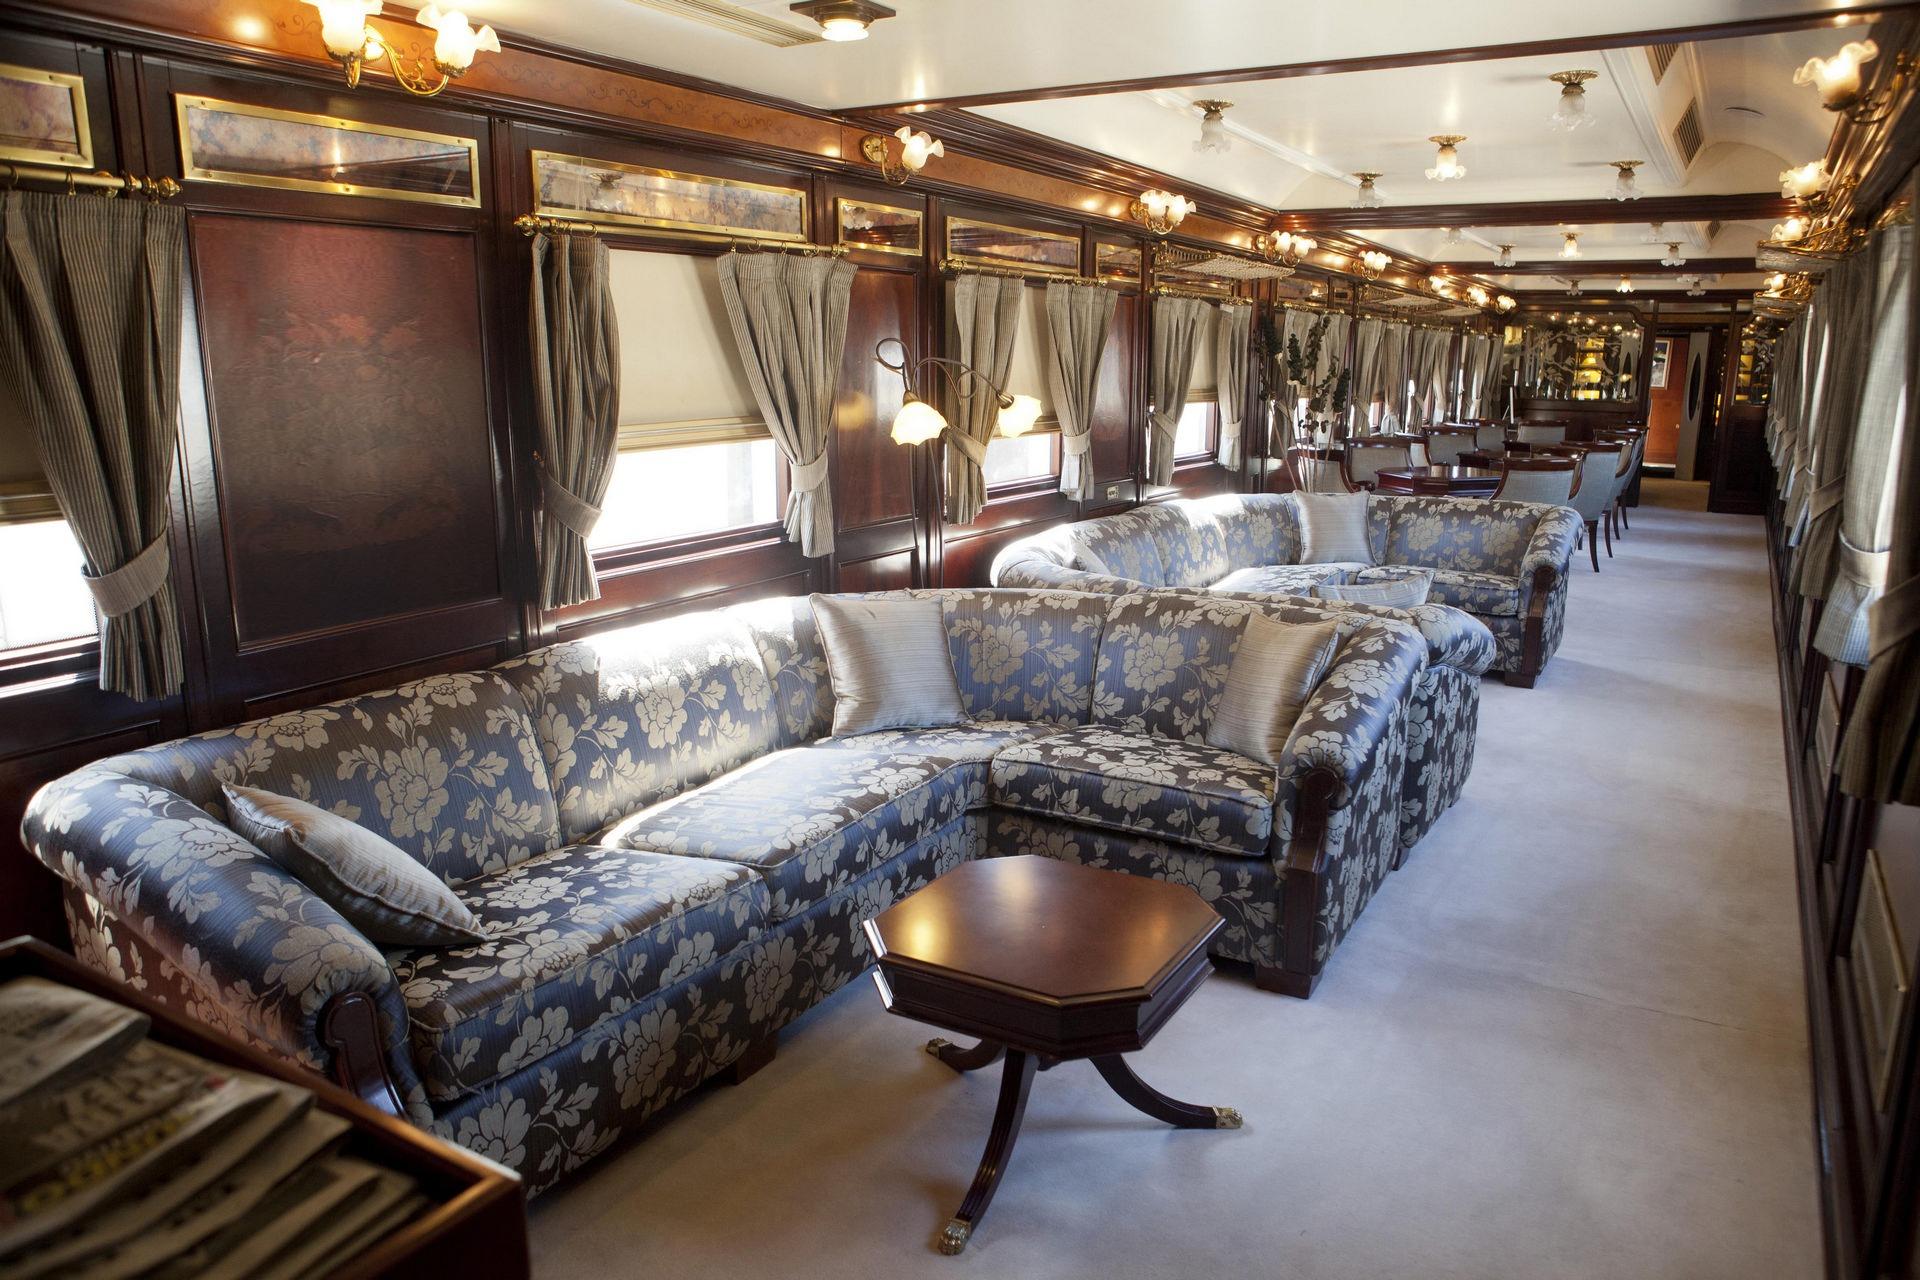 NOMAD-luksusowe-pociągi-w-Hiszpani-Al-Andalus-10